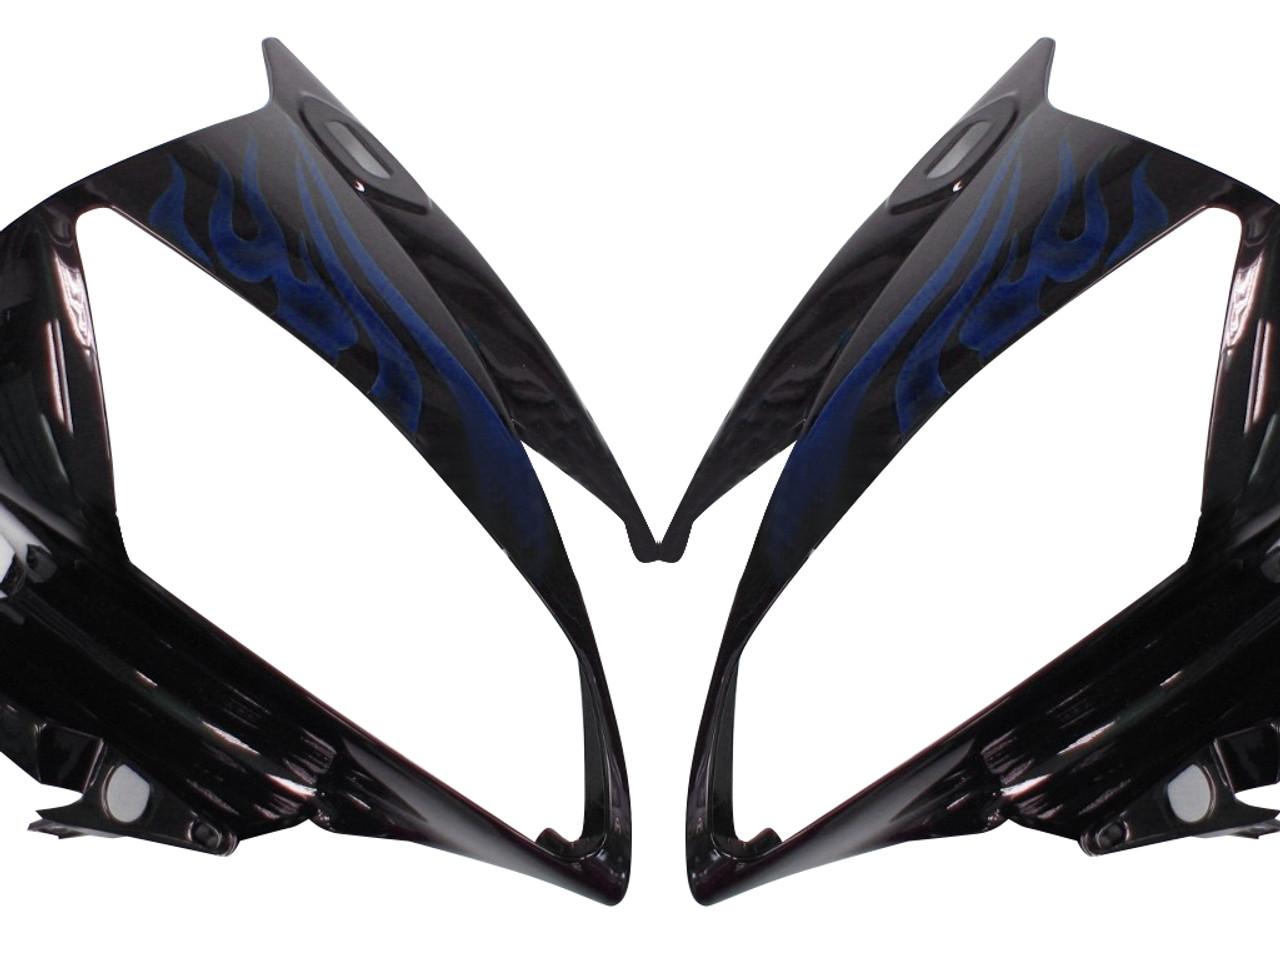 Fairings Yamaha YZF-R6 Black & Blue Flame R6 Racing (2006-2007)